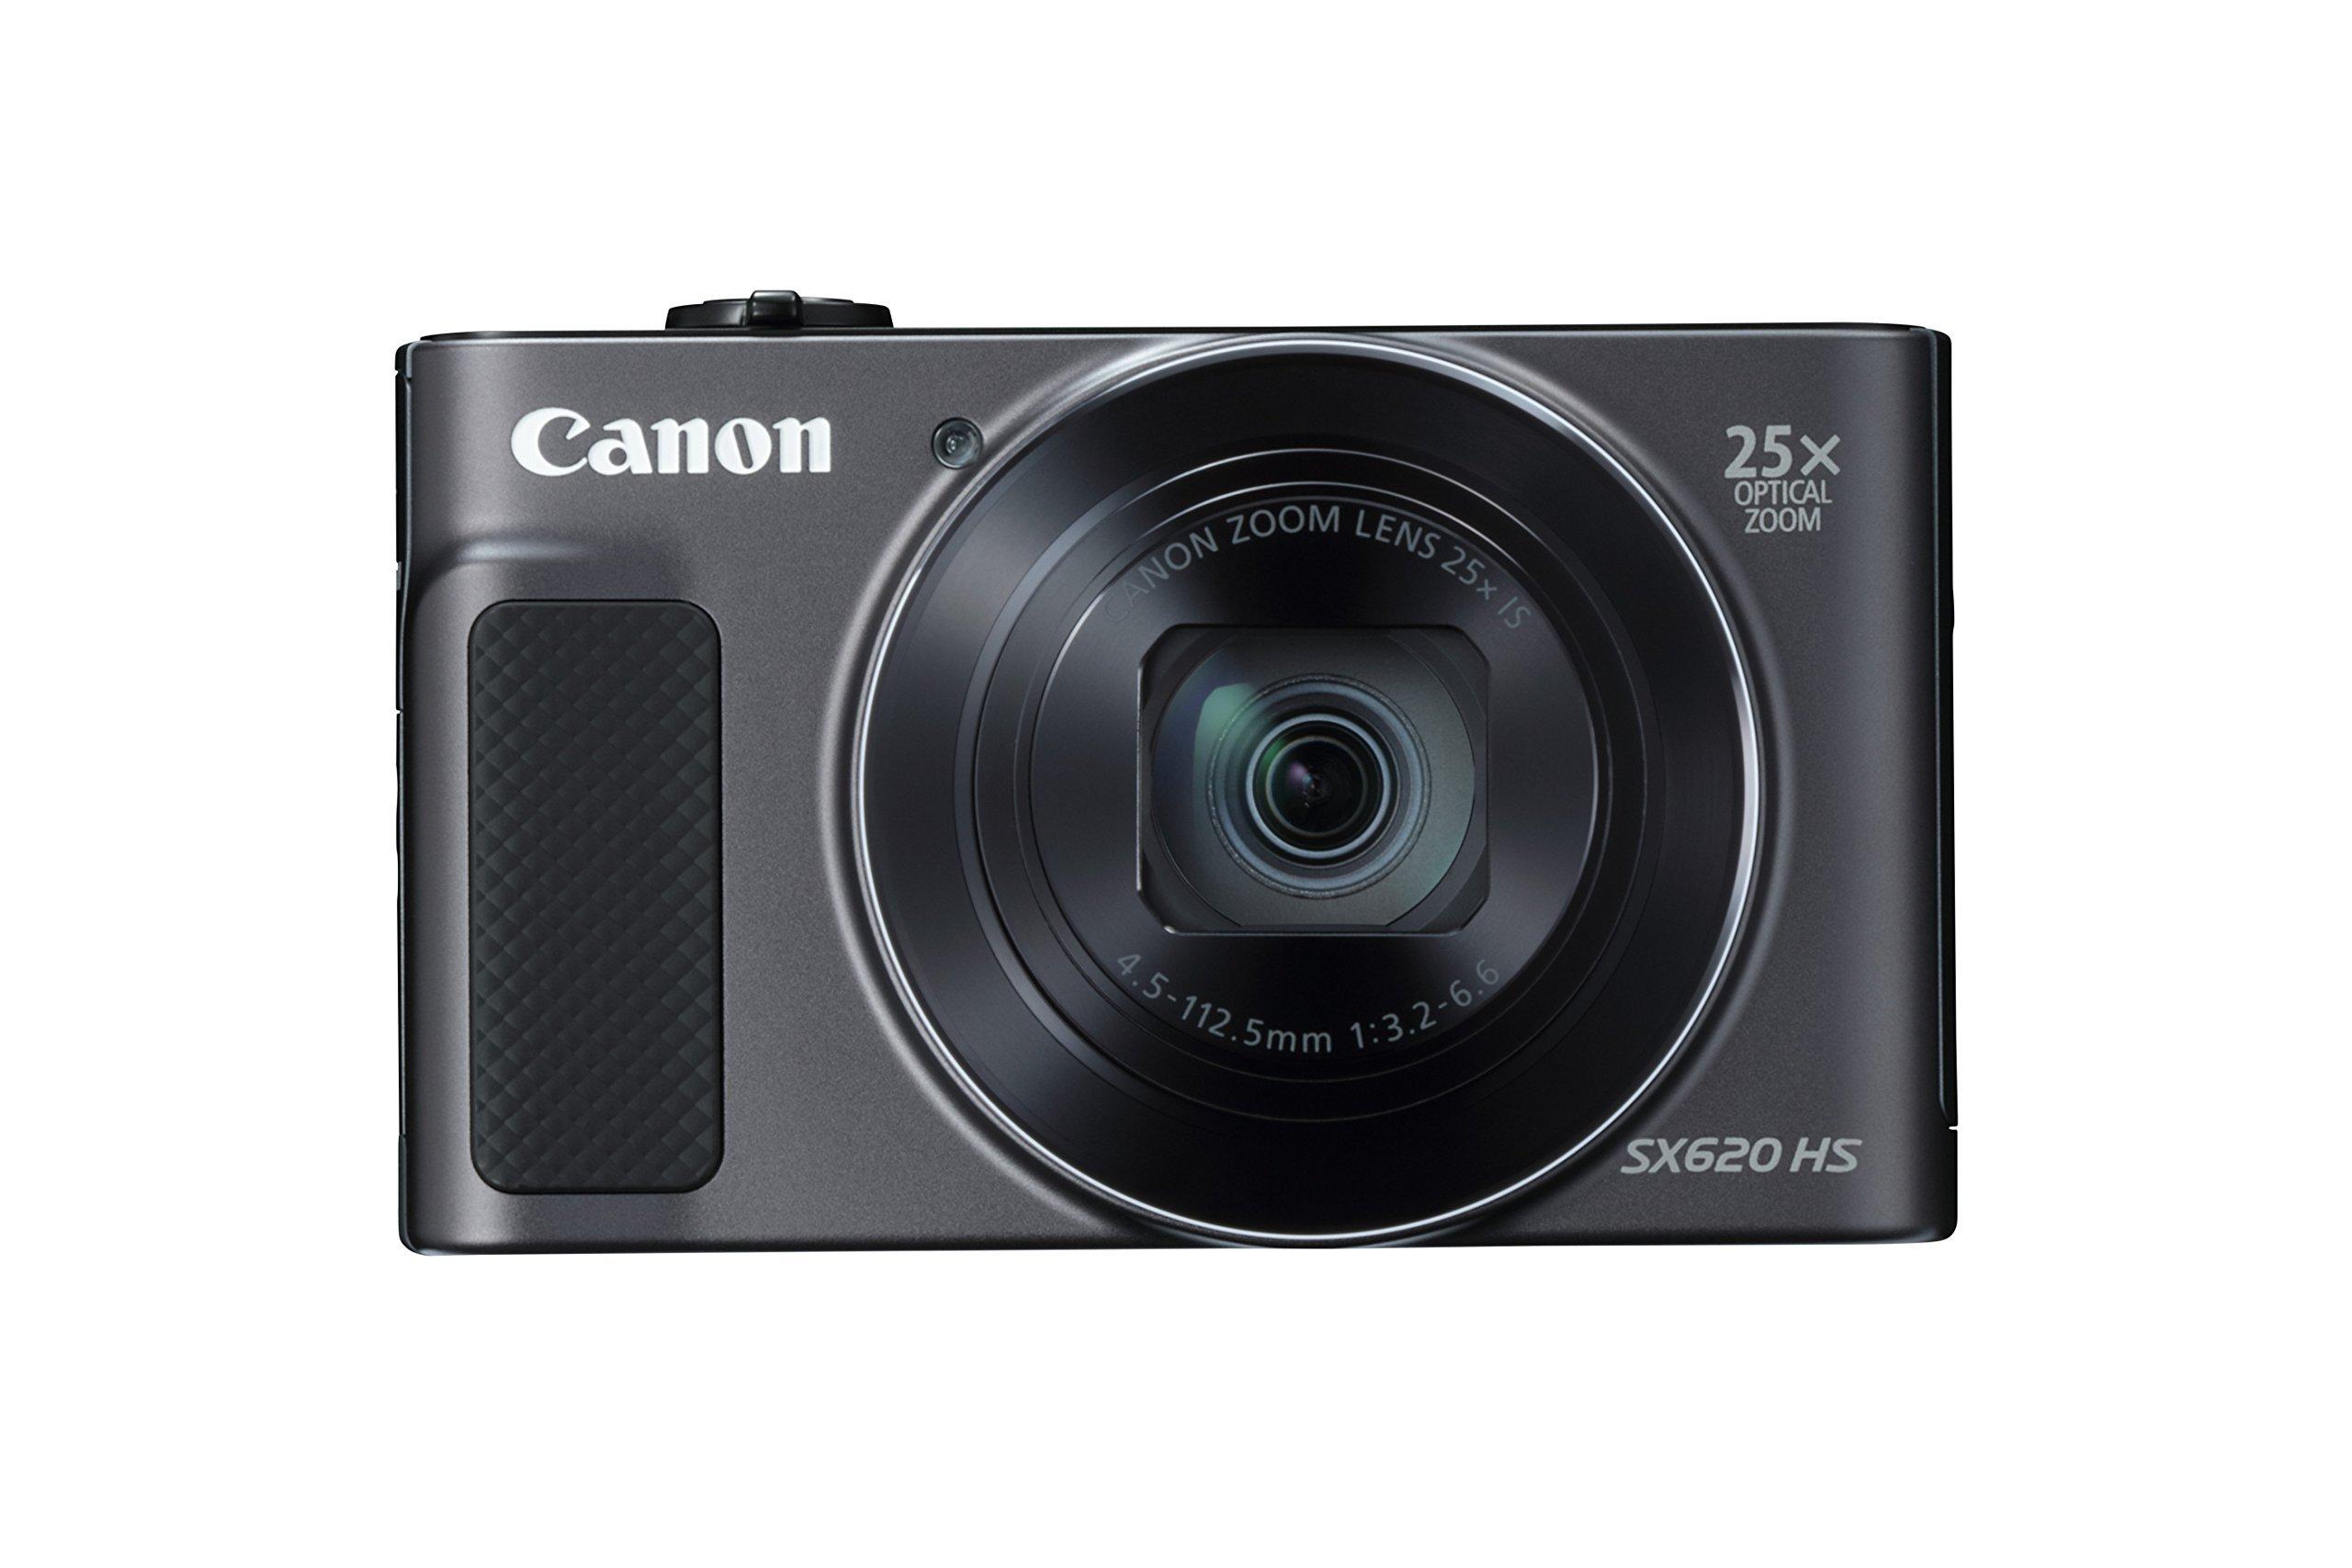 Canon PowerShot SX620 Digital Camera w/25x Optical Zoom - Wi-Fi & NFC Enabled (Black) (Renewed)